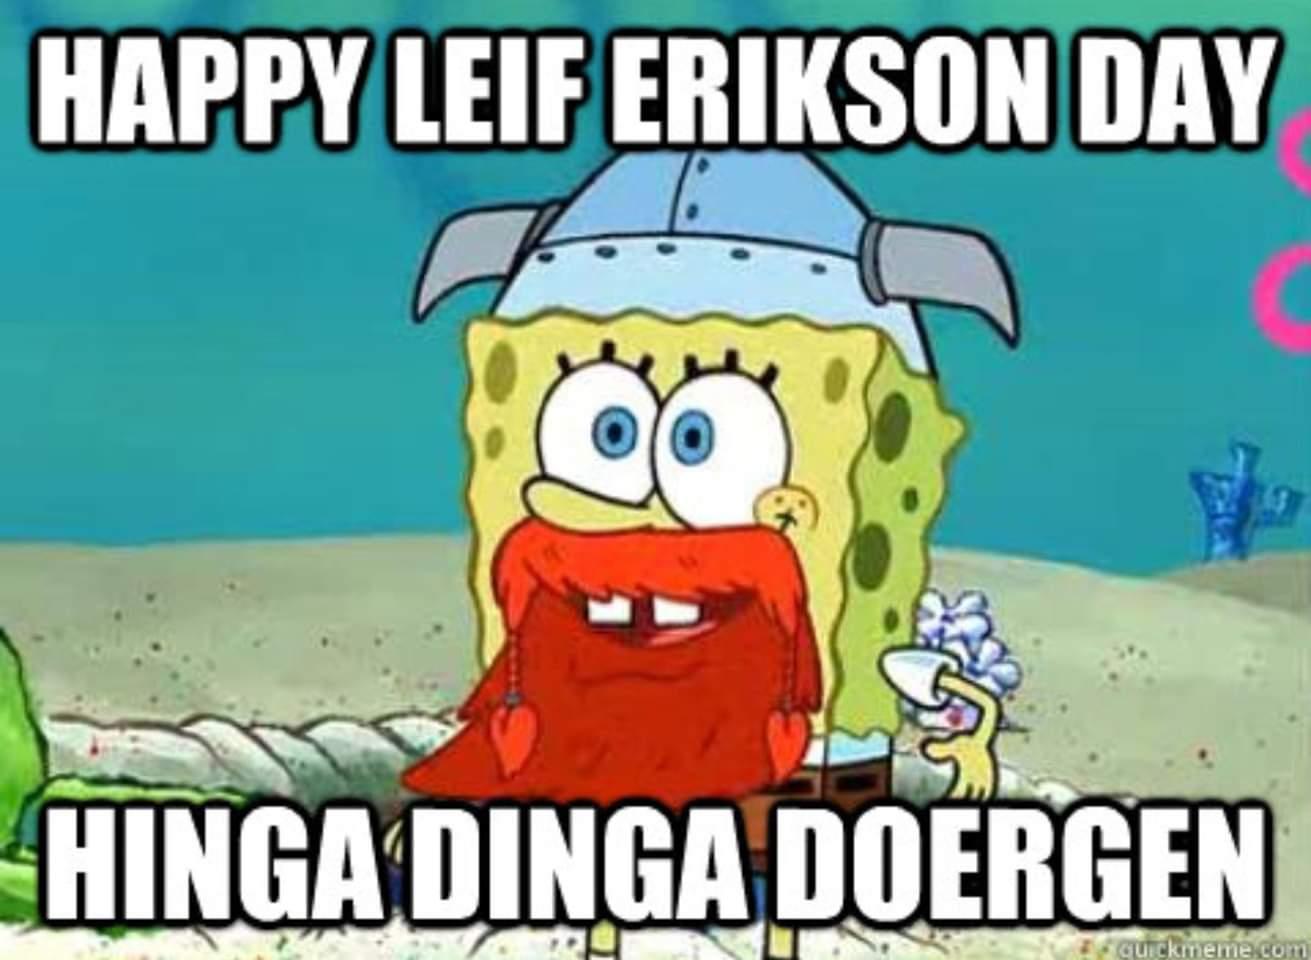 Spongebob Leif Erikson Day Memes - Hinga Dinga Doergen